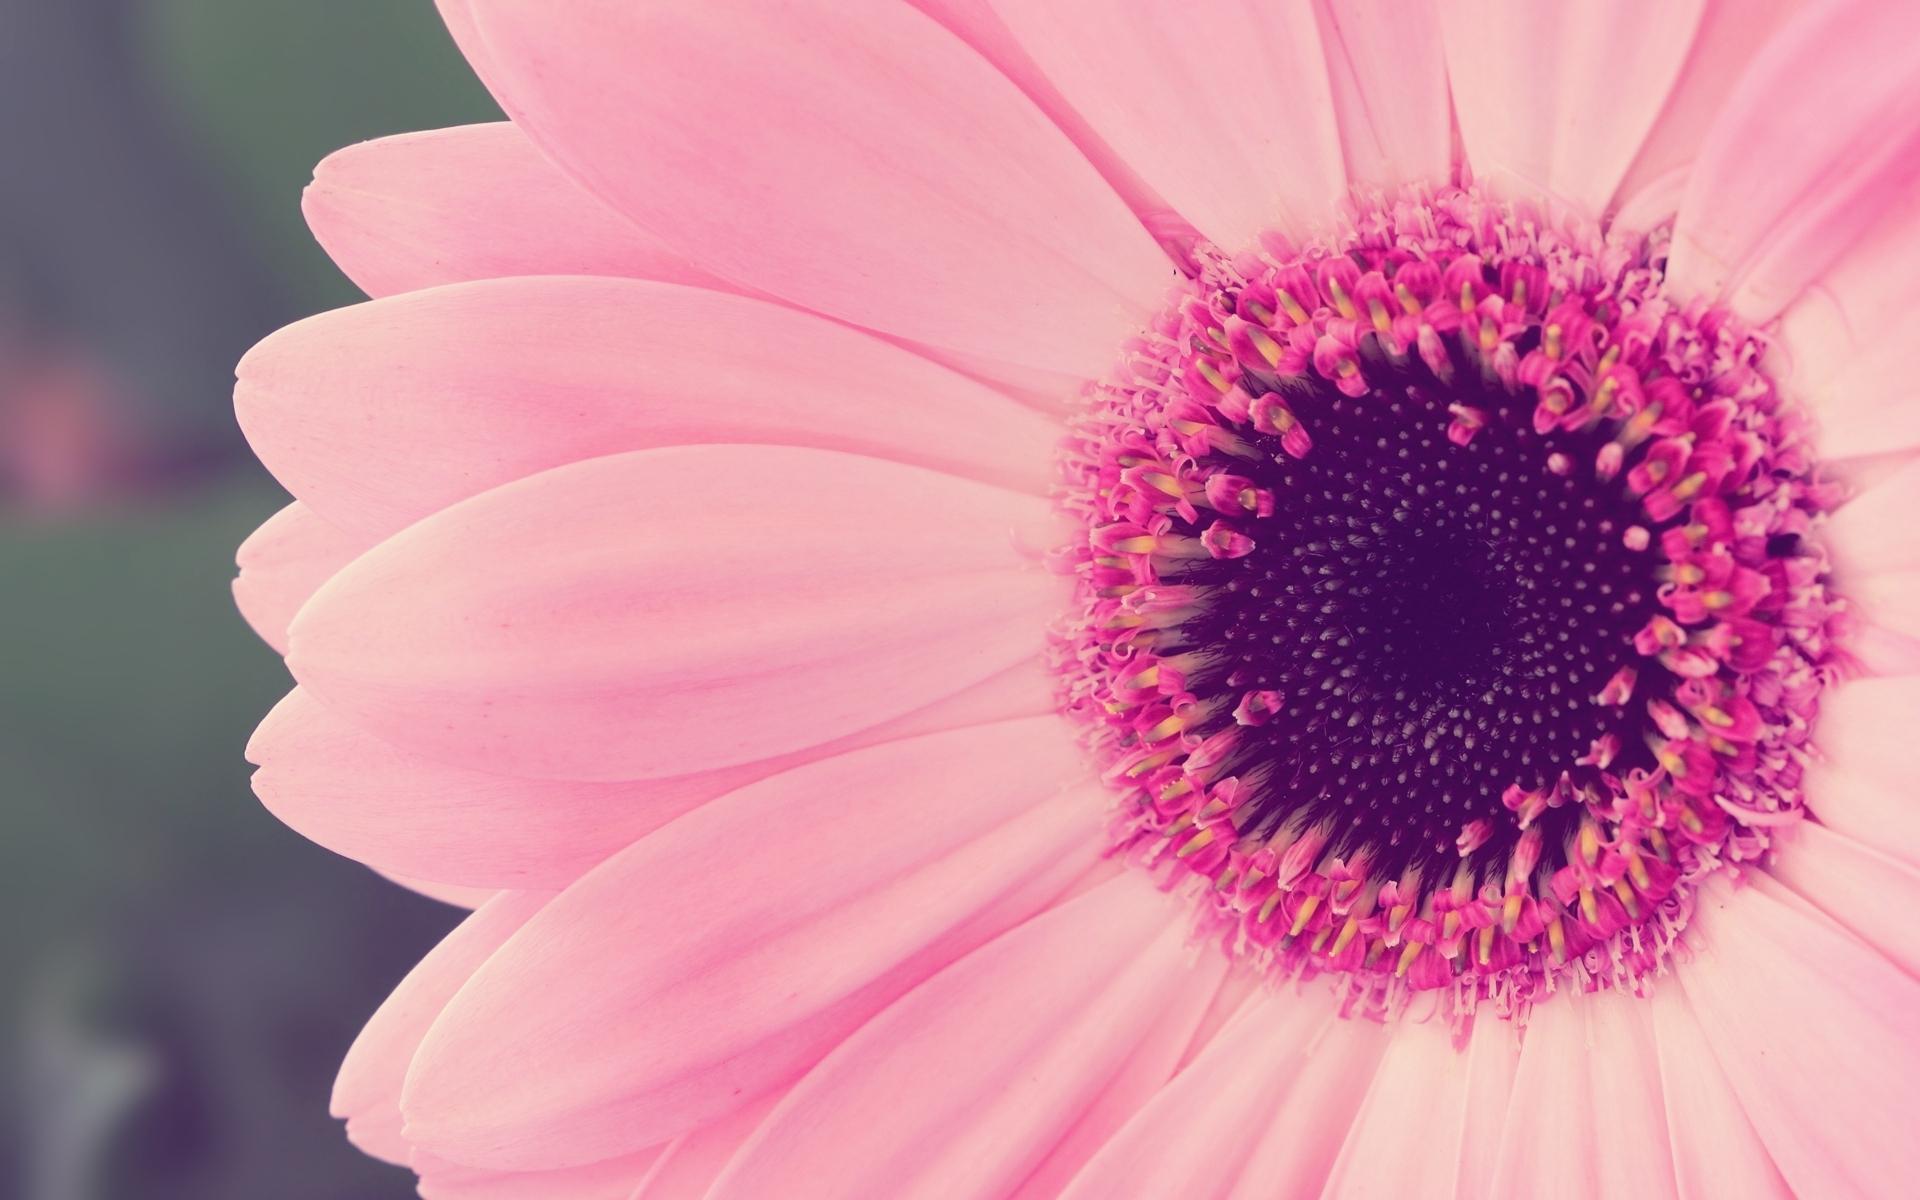 Beautiful Pink Flowers Wallpaper Hd pink flower wallpaper